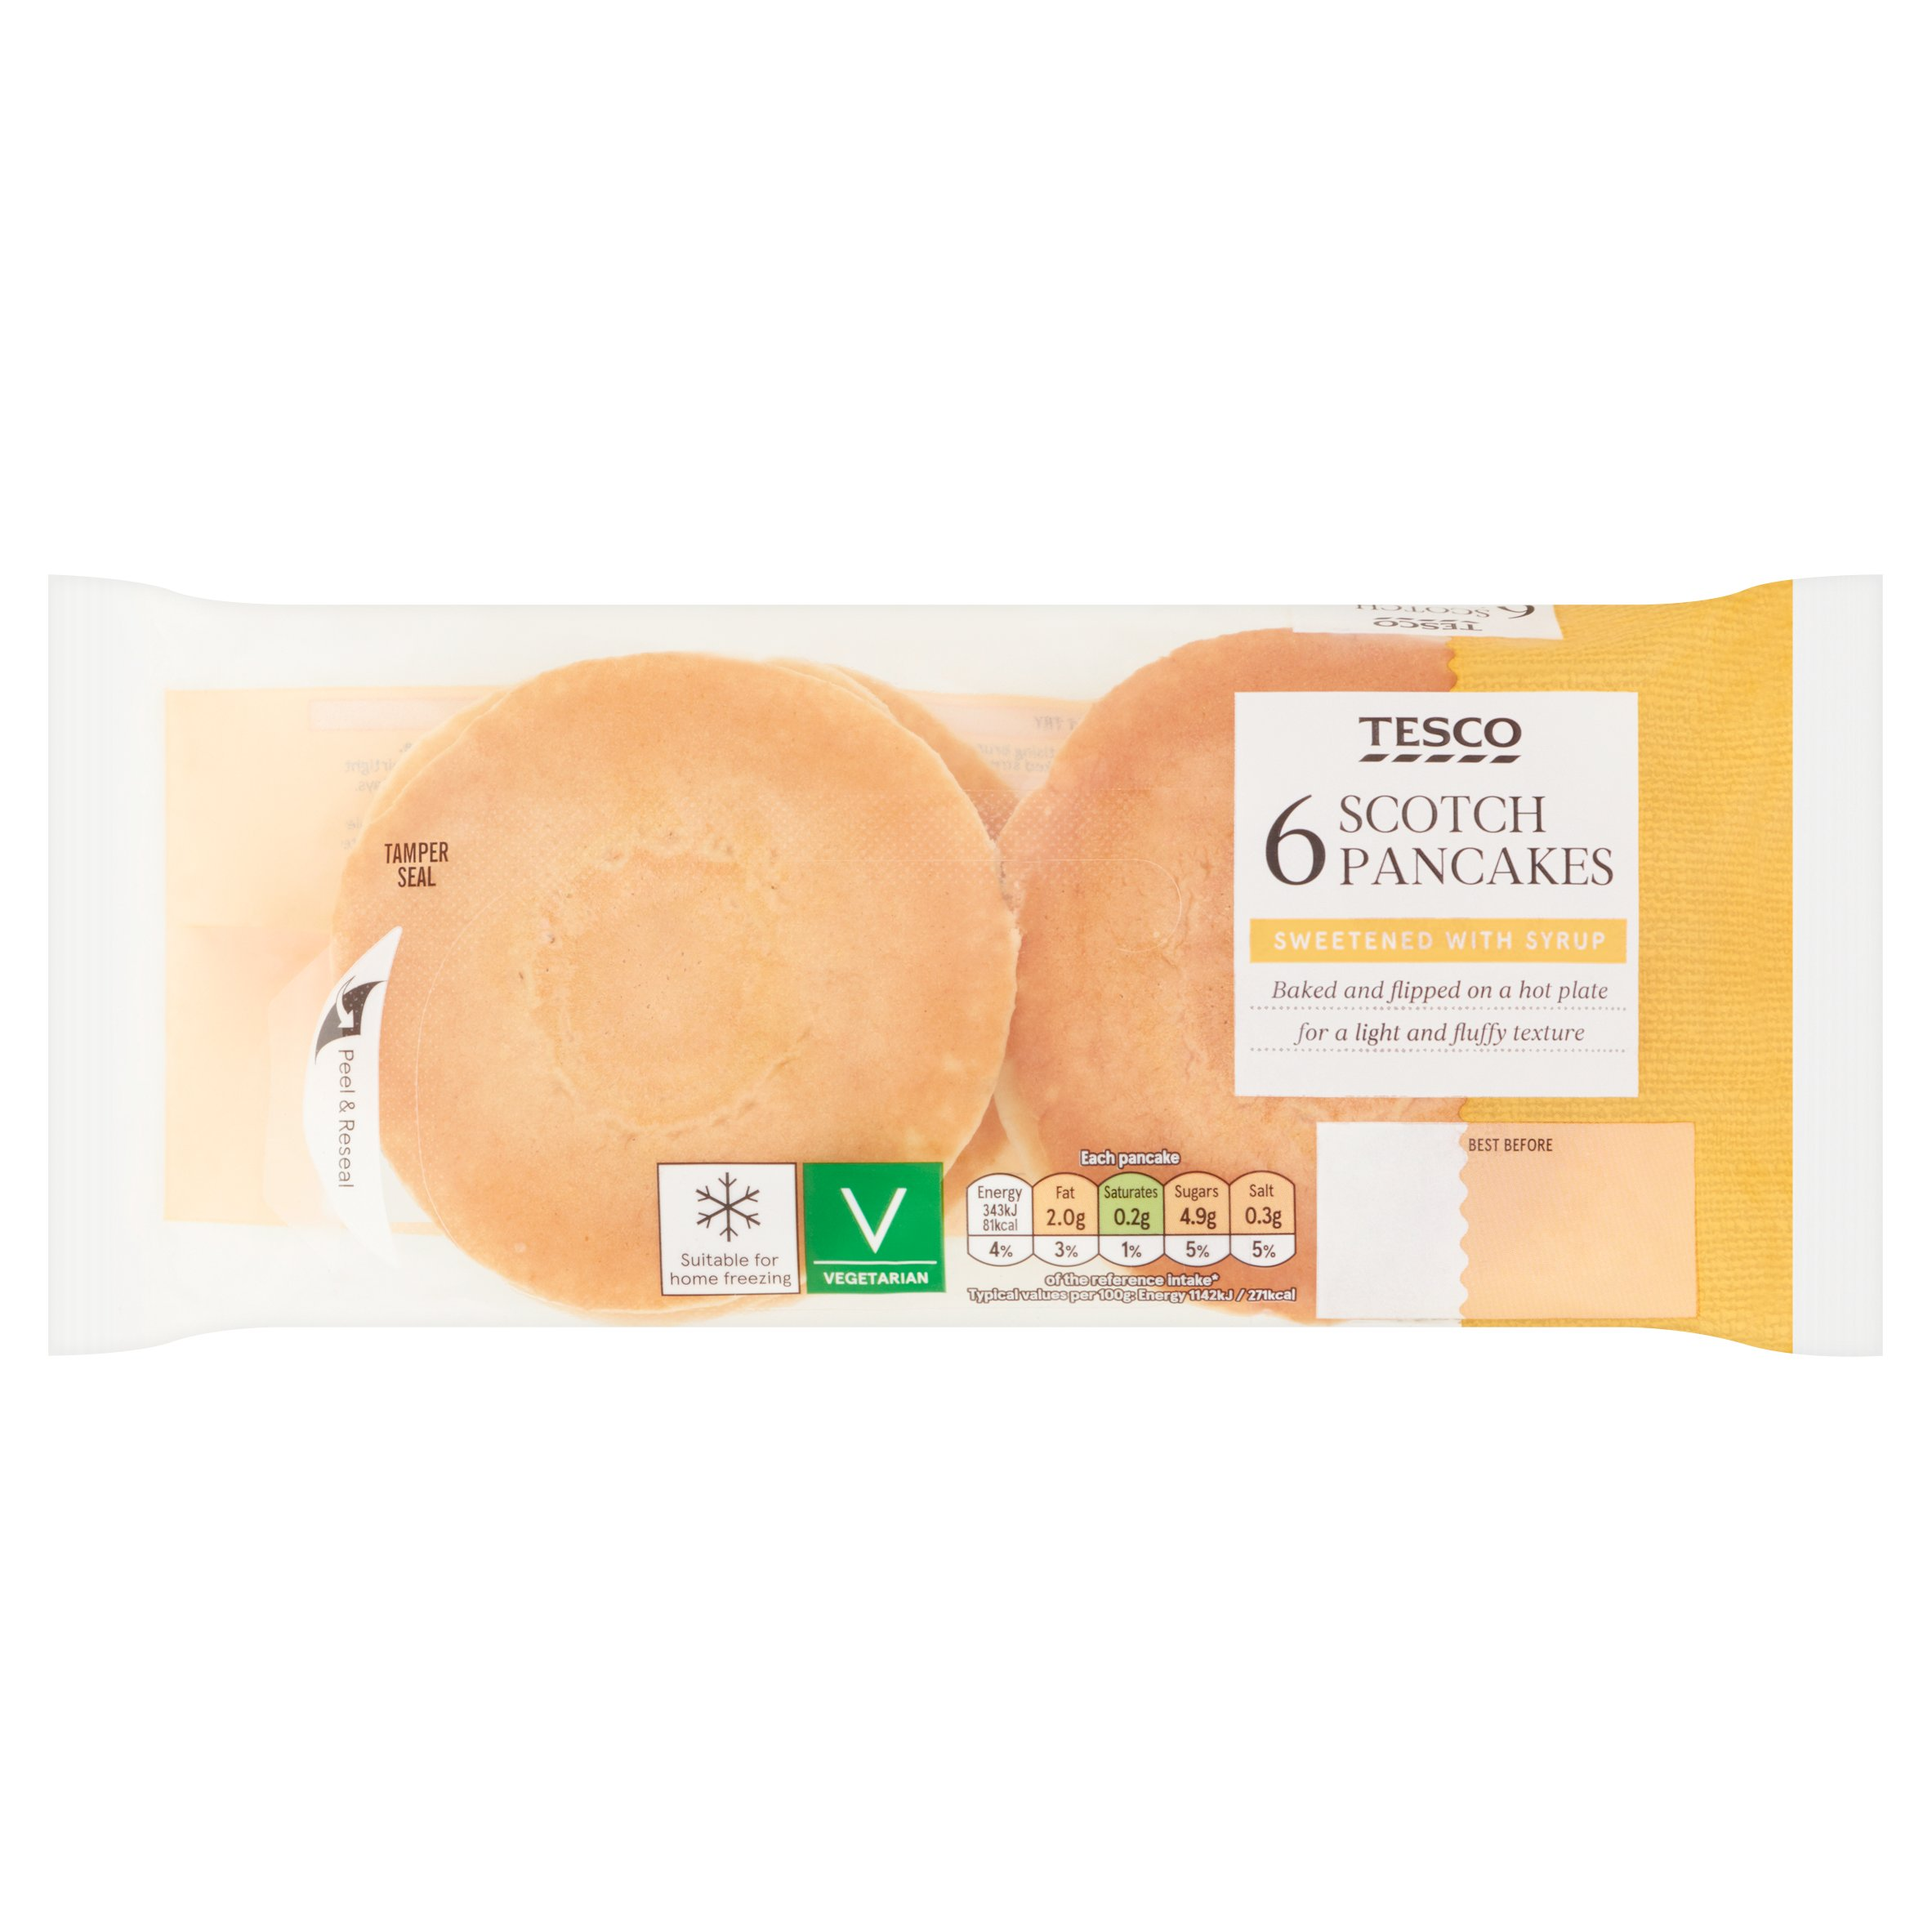 Tesco 6 Scotch Pancakes